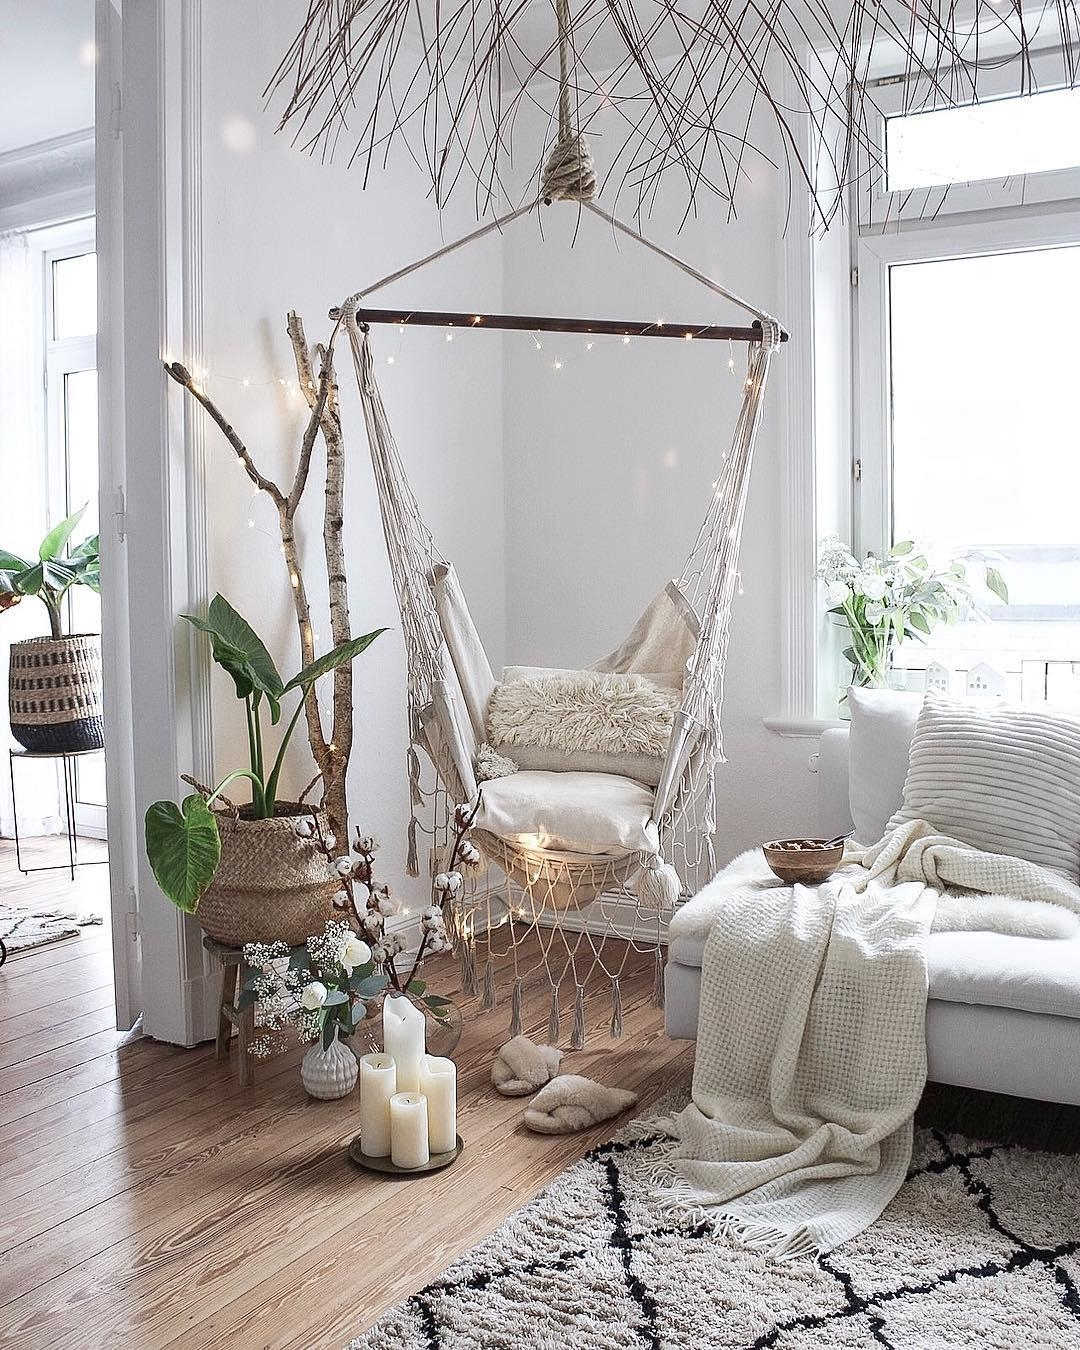 Wer schaukelt mit mir hangingchair h ngesessel - Cosy home deko ...